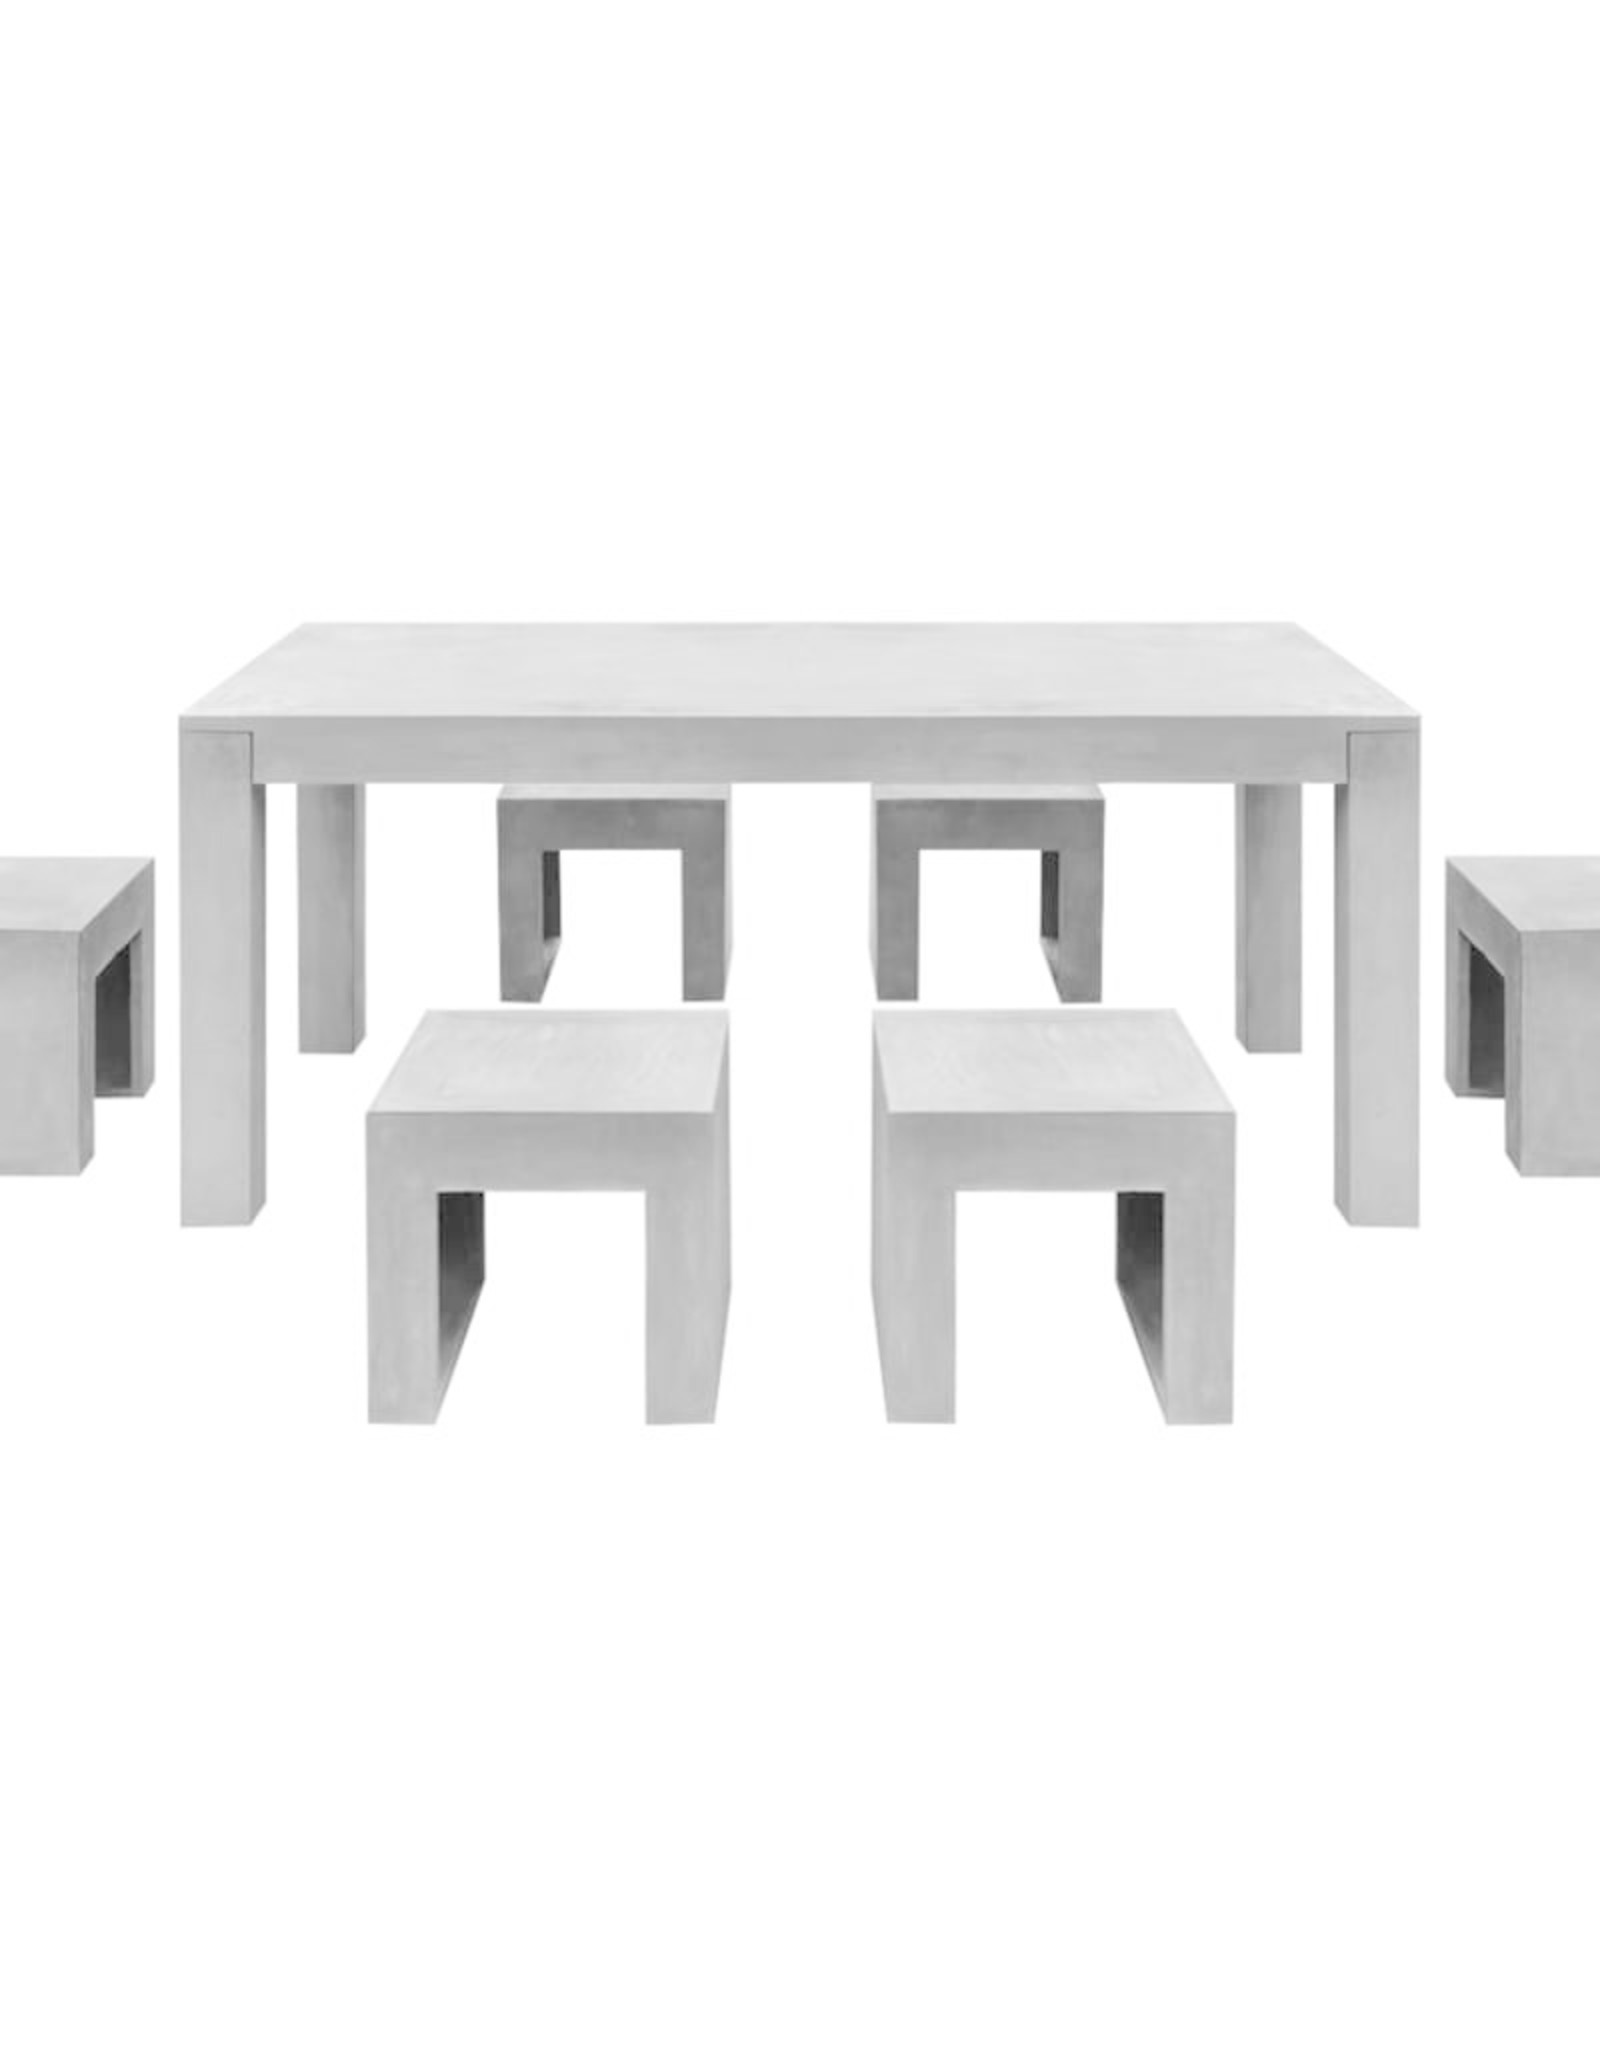 7-delig Tuinset beton